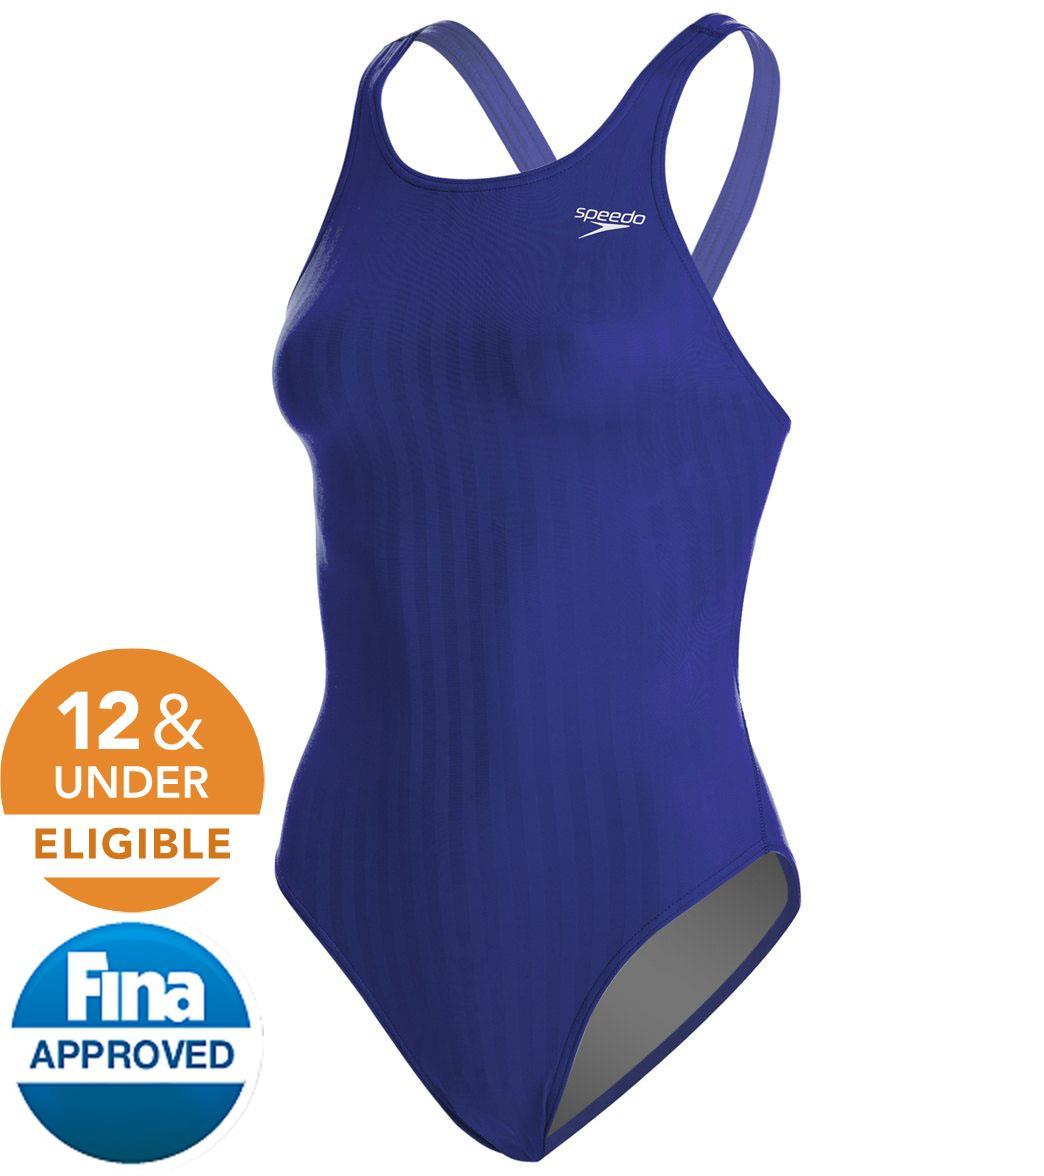 afa494b8acba Speedo Aquablade Female Recordbreaker Tech Suit Swimsuit at ...